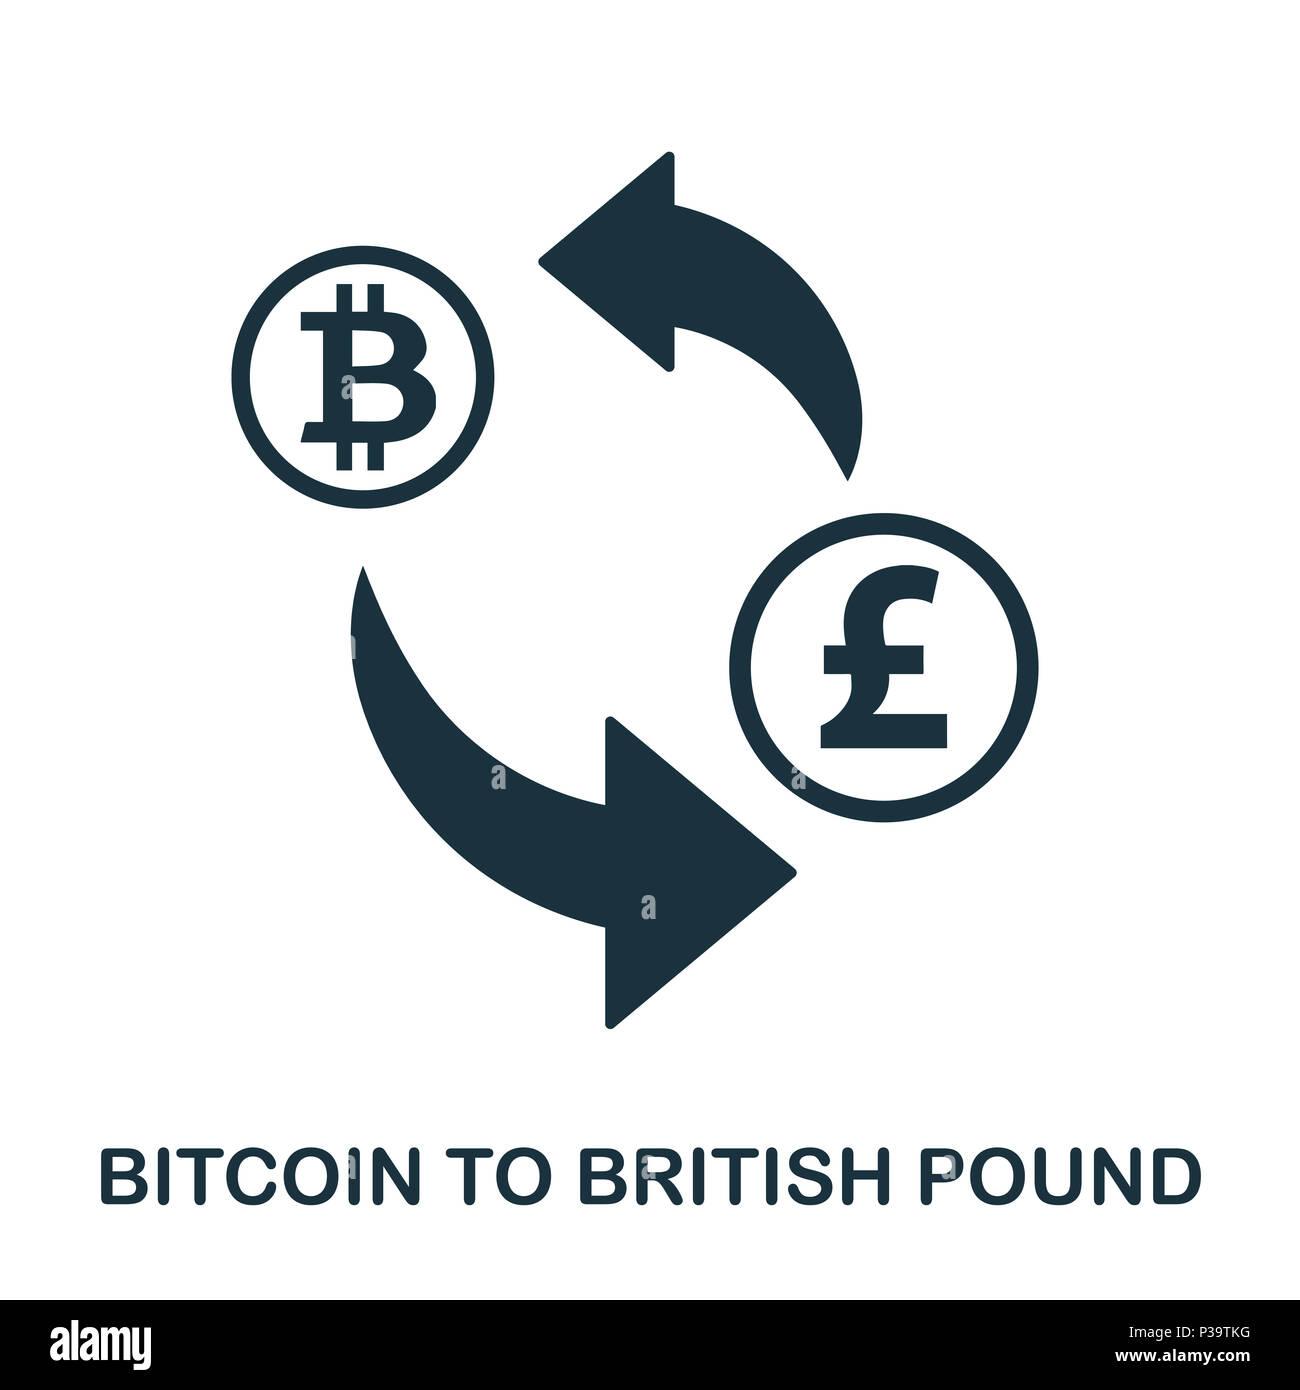 Bitcoin To British Pound icon. Mobile app, printing, web site icon. Simple element sing. Monochrome Bitcoin To British Pound icon illustration. Stock Photo